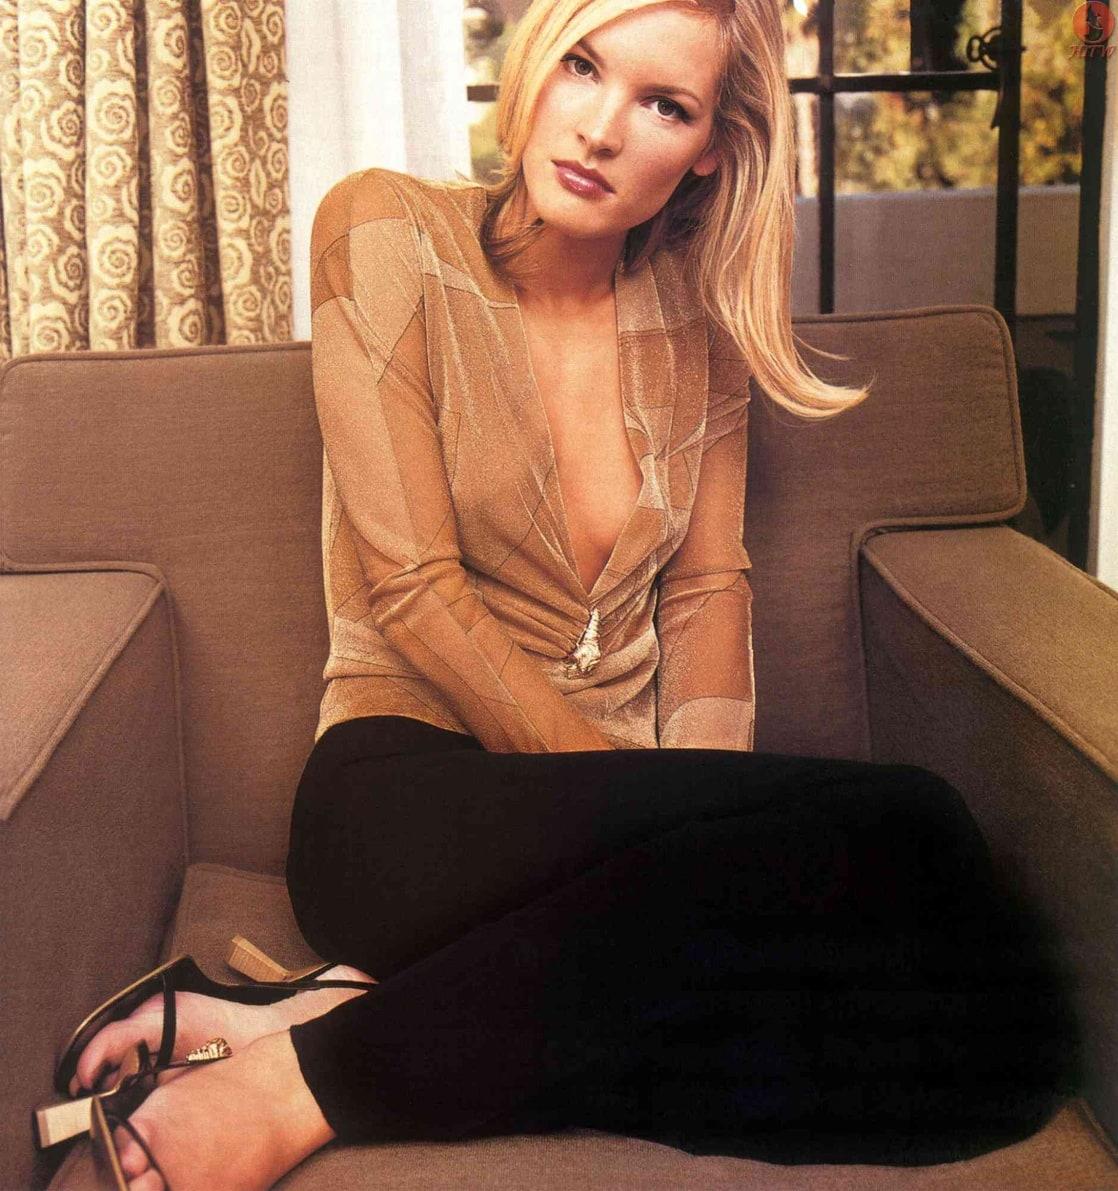 Judith Ivey born September 4, 1951 (age 67) foto